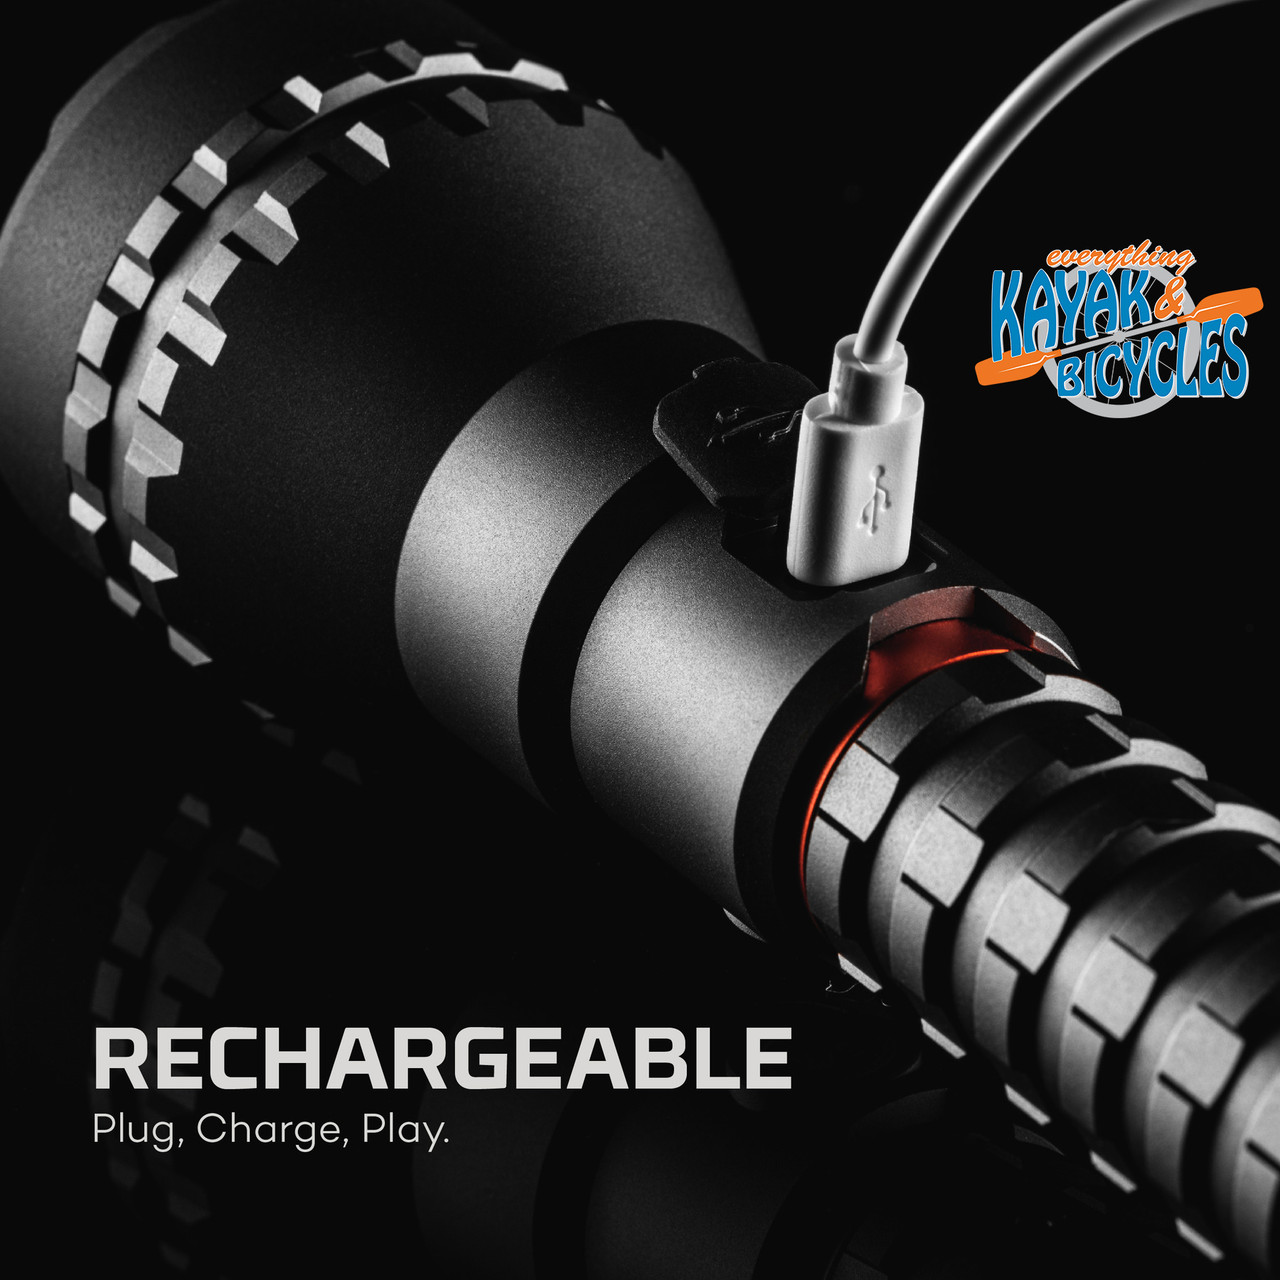 USB-C Rechargeable